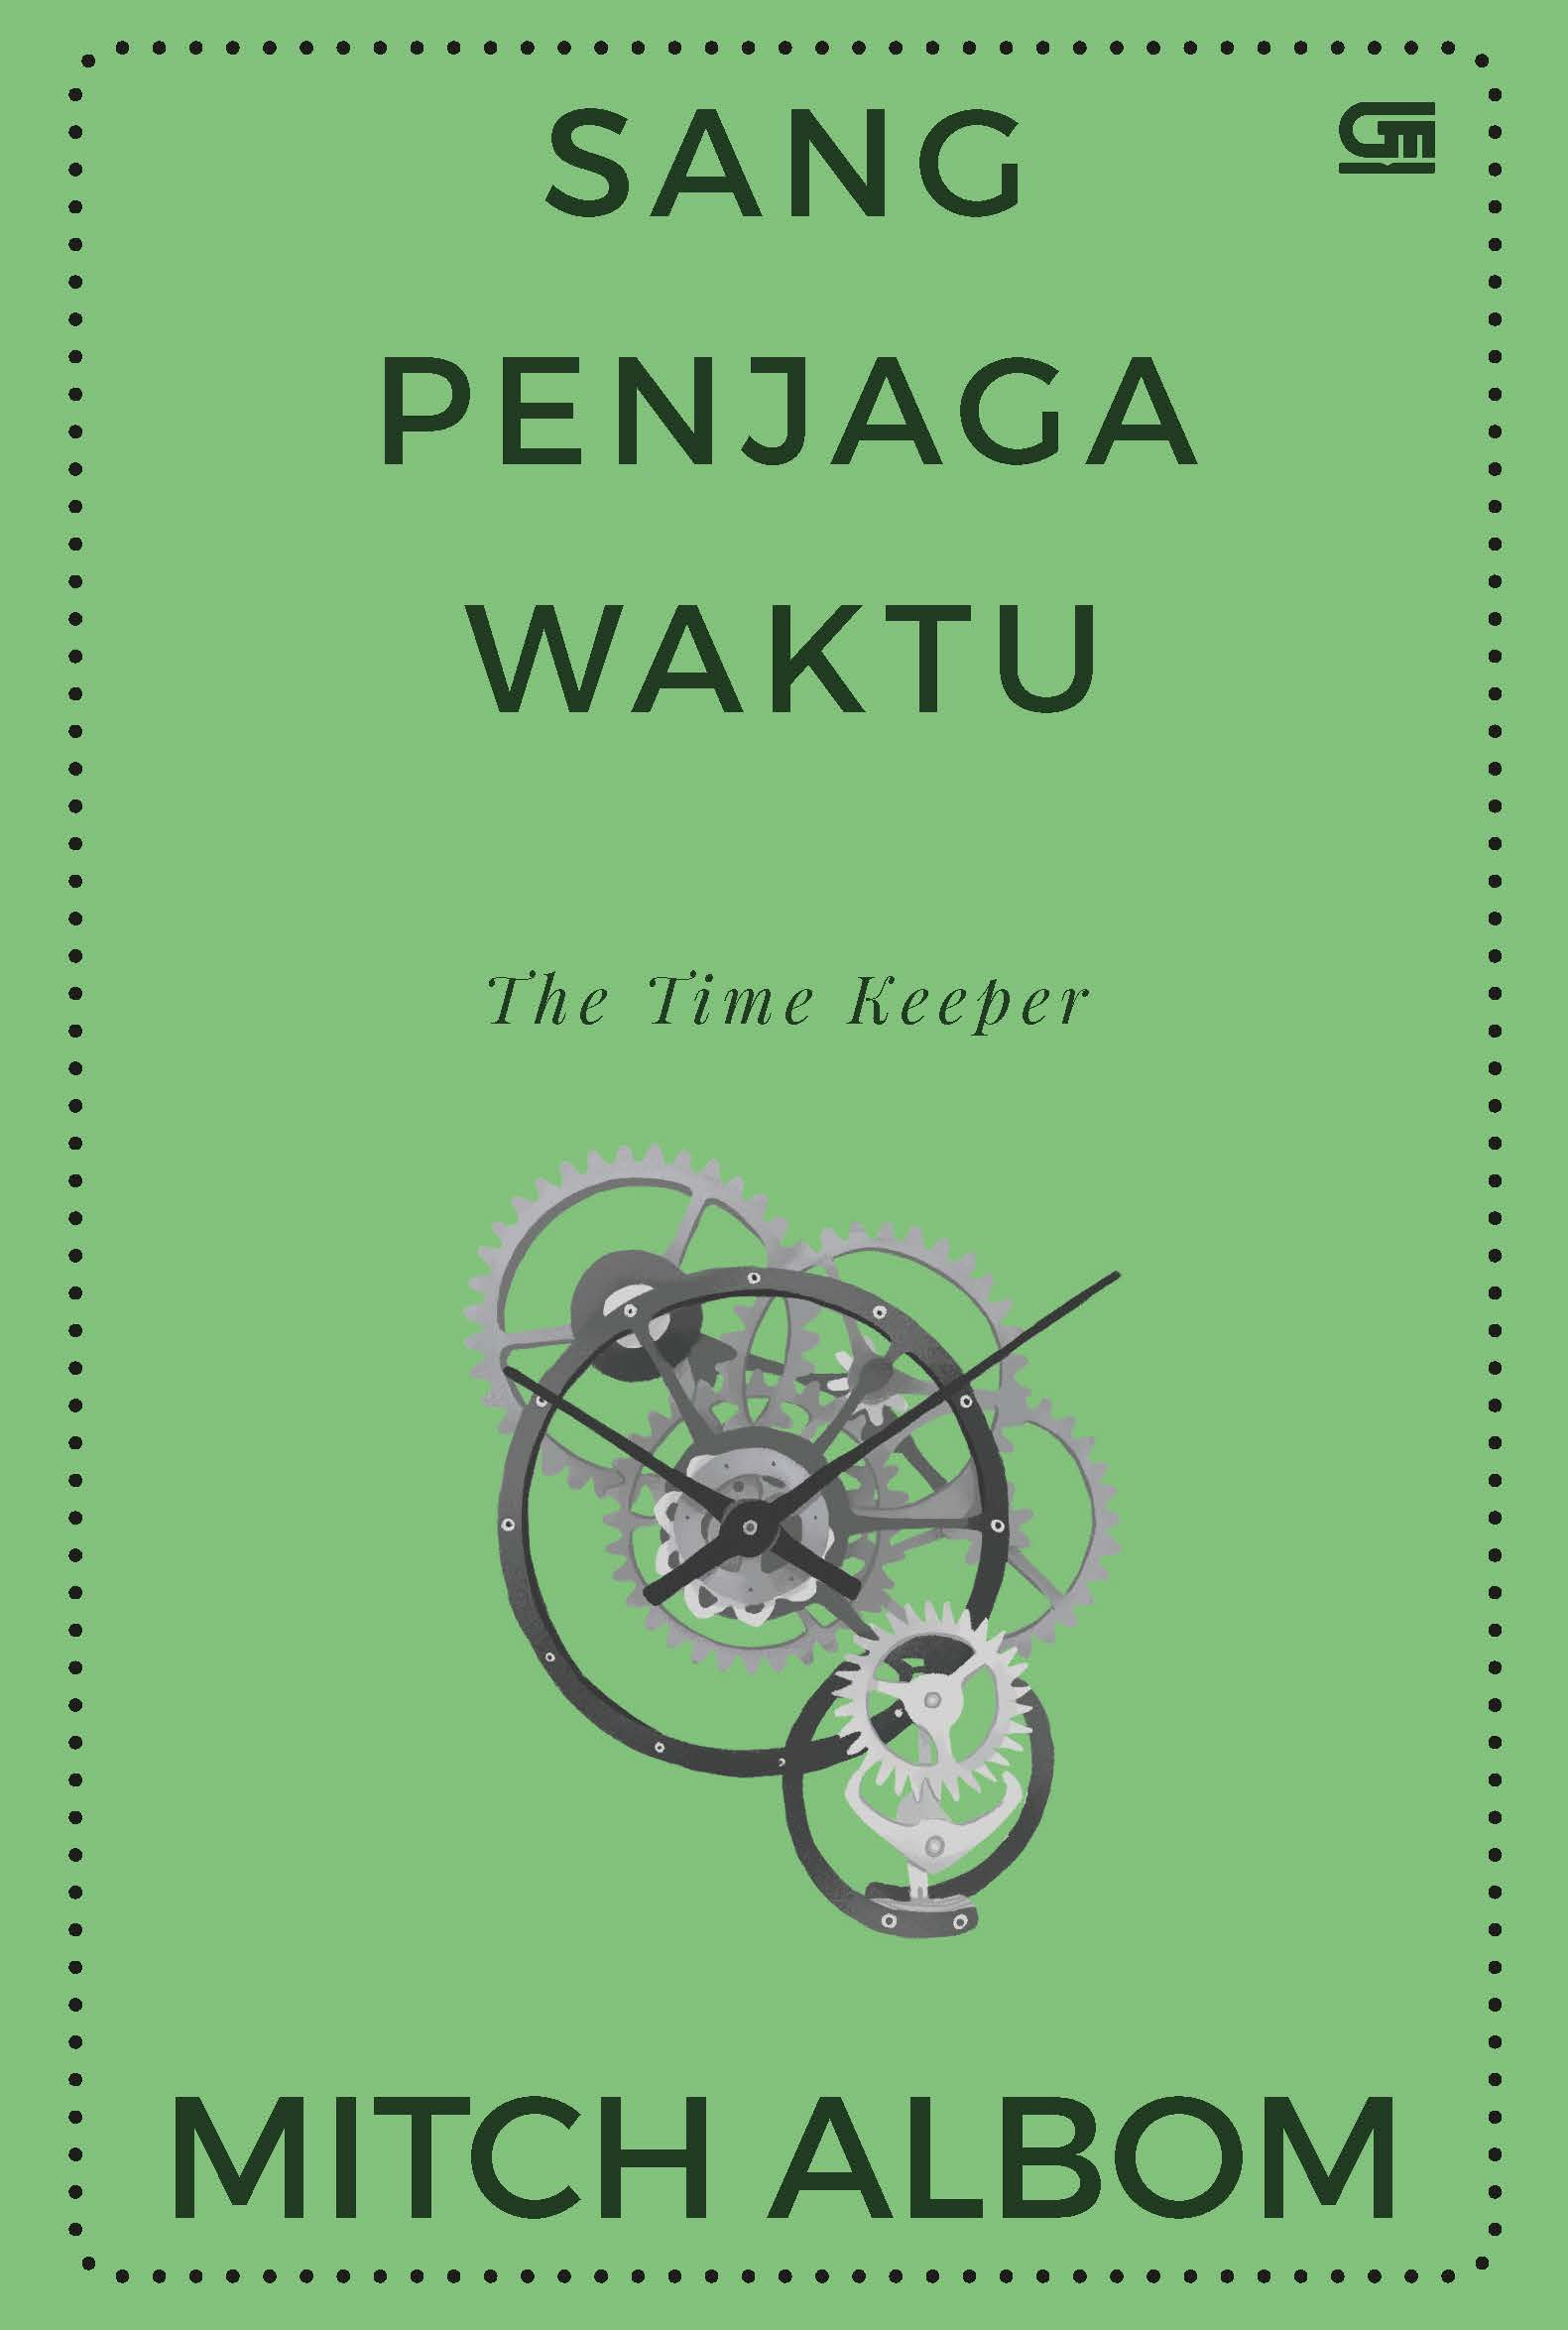 Sang Penjaga Waktu (The Time Keeper)